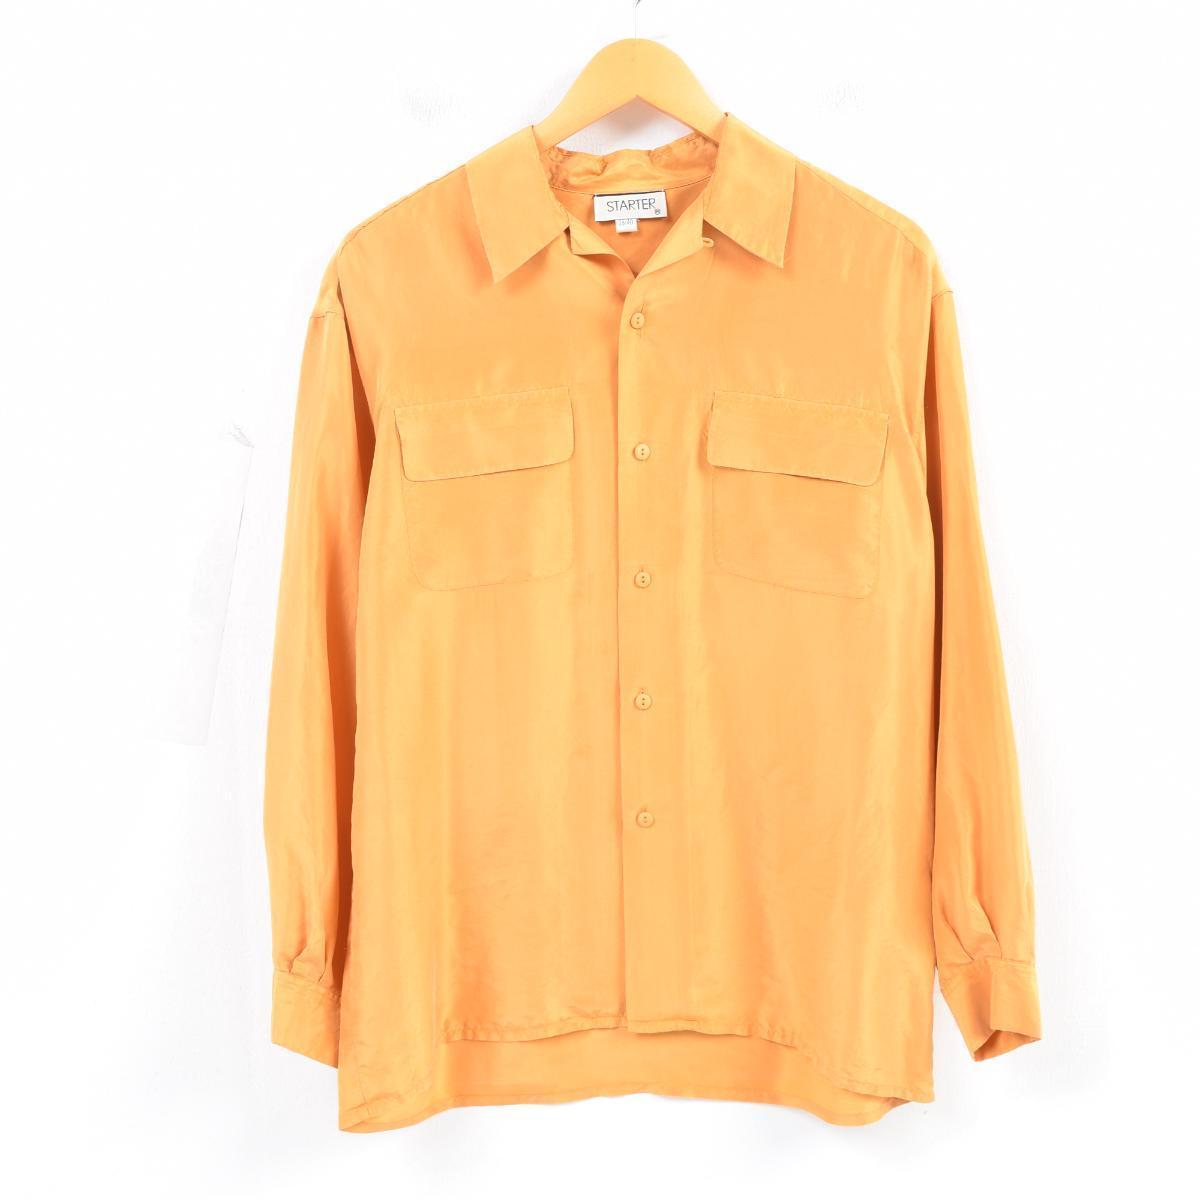 6c13bd999eaa4e VINTAGE CLOTHING JAM  Open collar long sleeves silk shirt men L ...